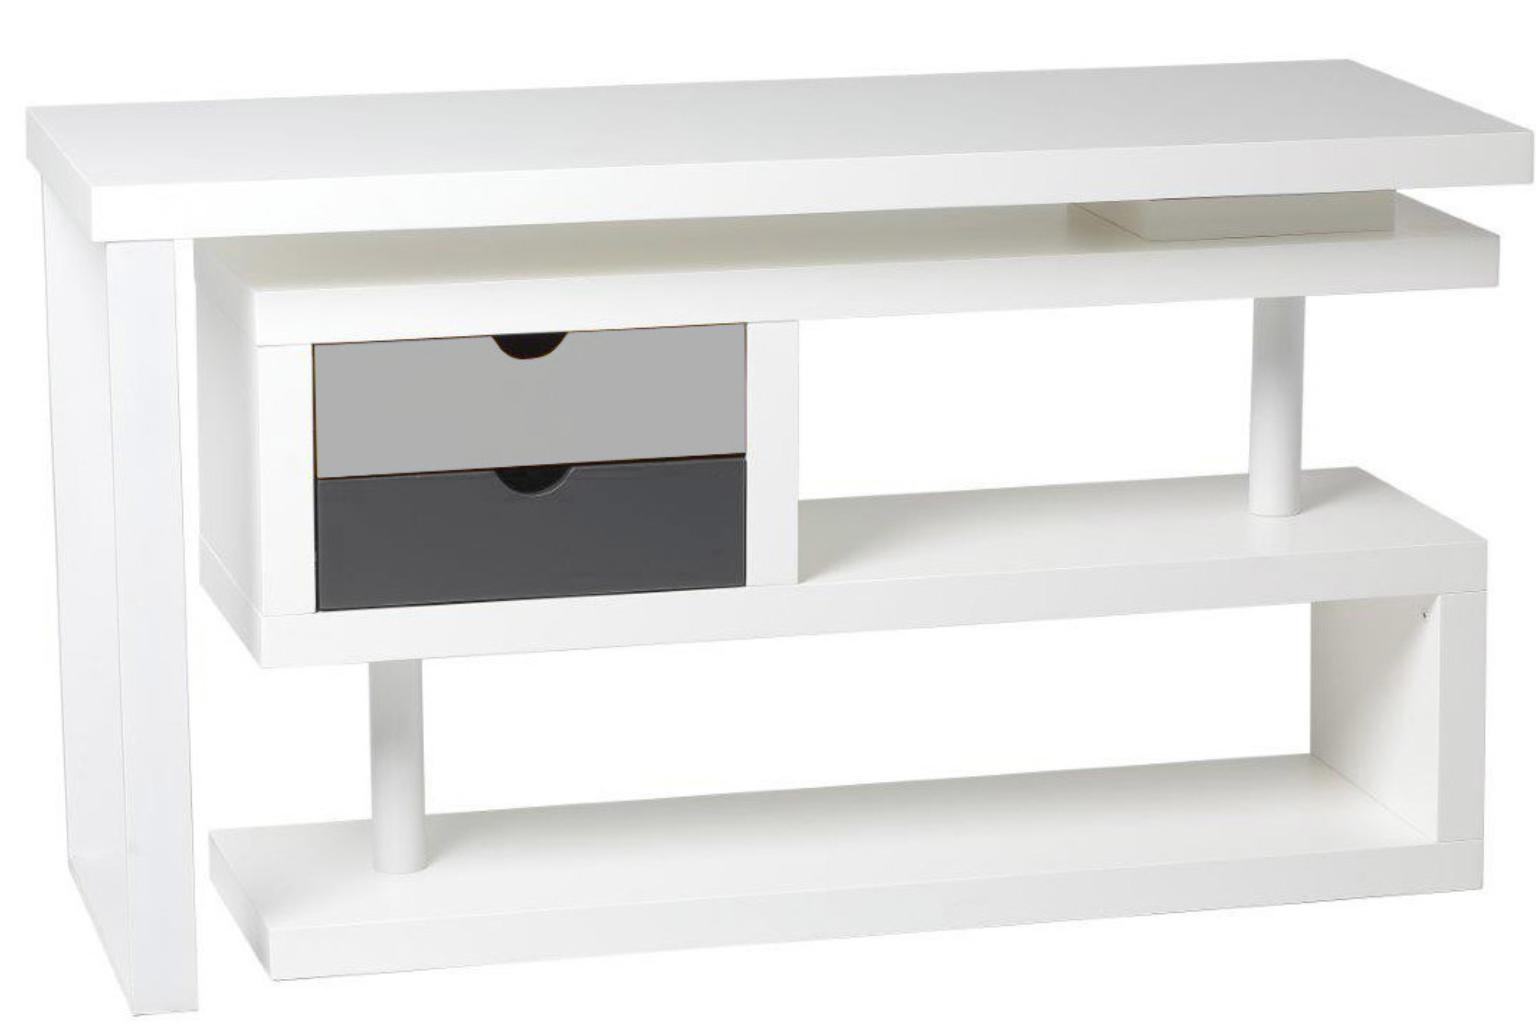 bureau angle pivotant laqu blanc topten. Black Bedroom Furniture Sets. Home Design Ideas